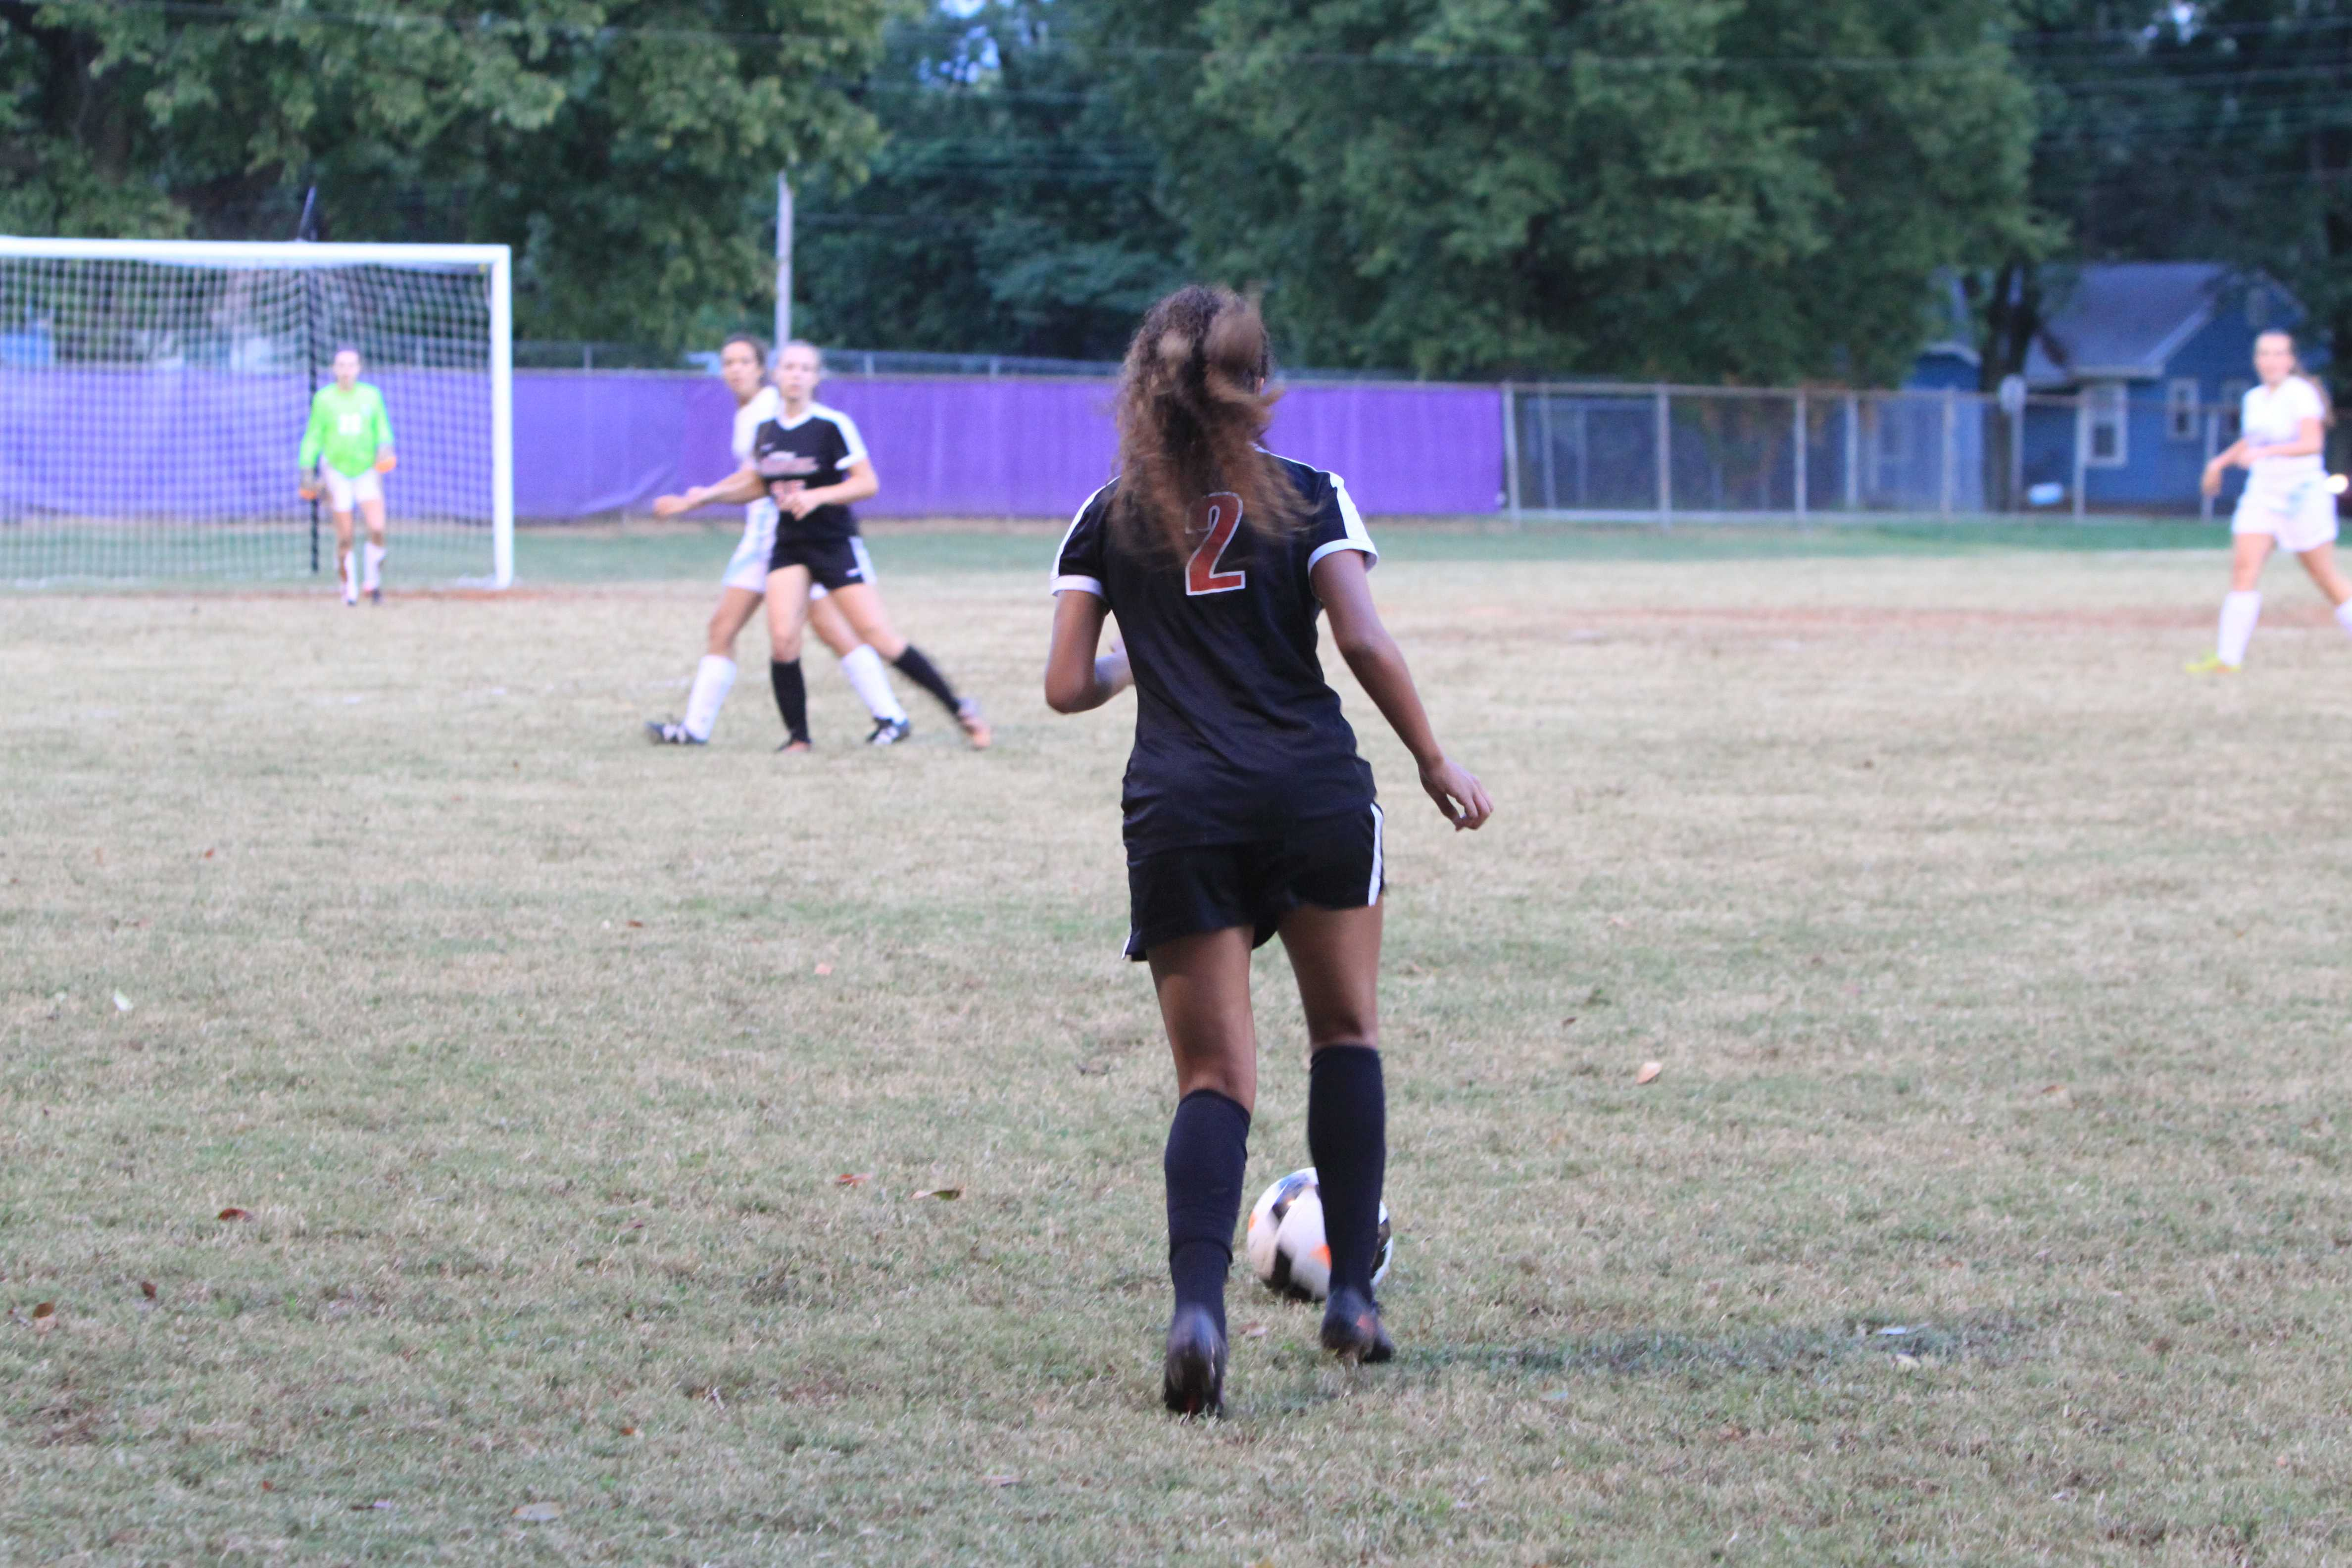 Jolene Ballard (2, 10) with the ball on a free kick.